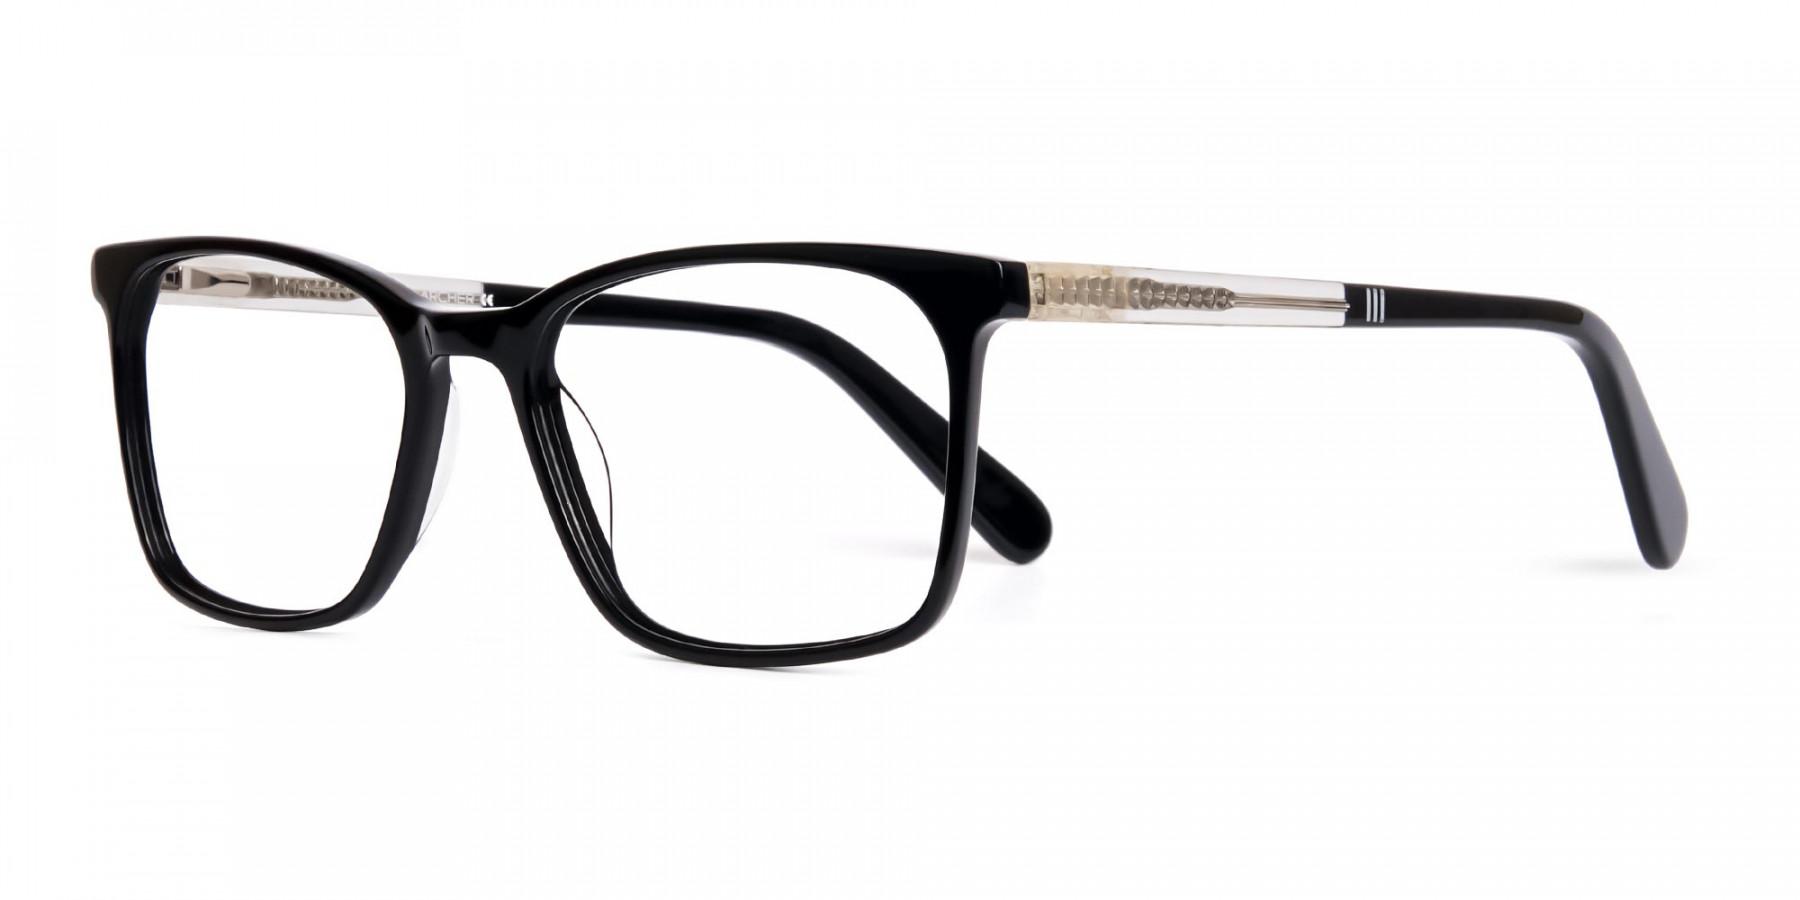 black-and-transparent-rectangular-glasses-frames-1